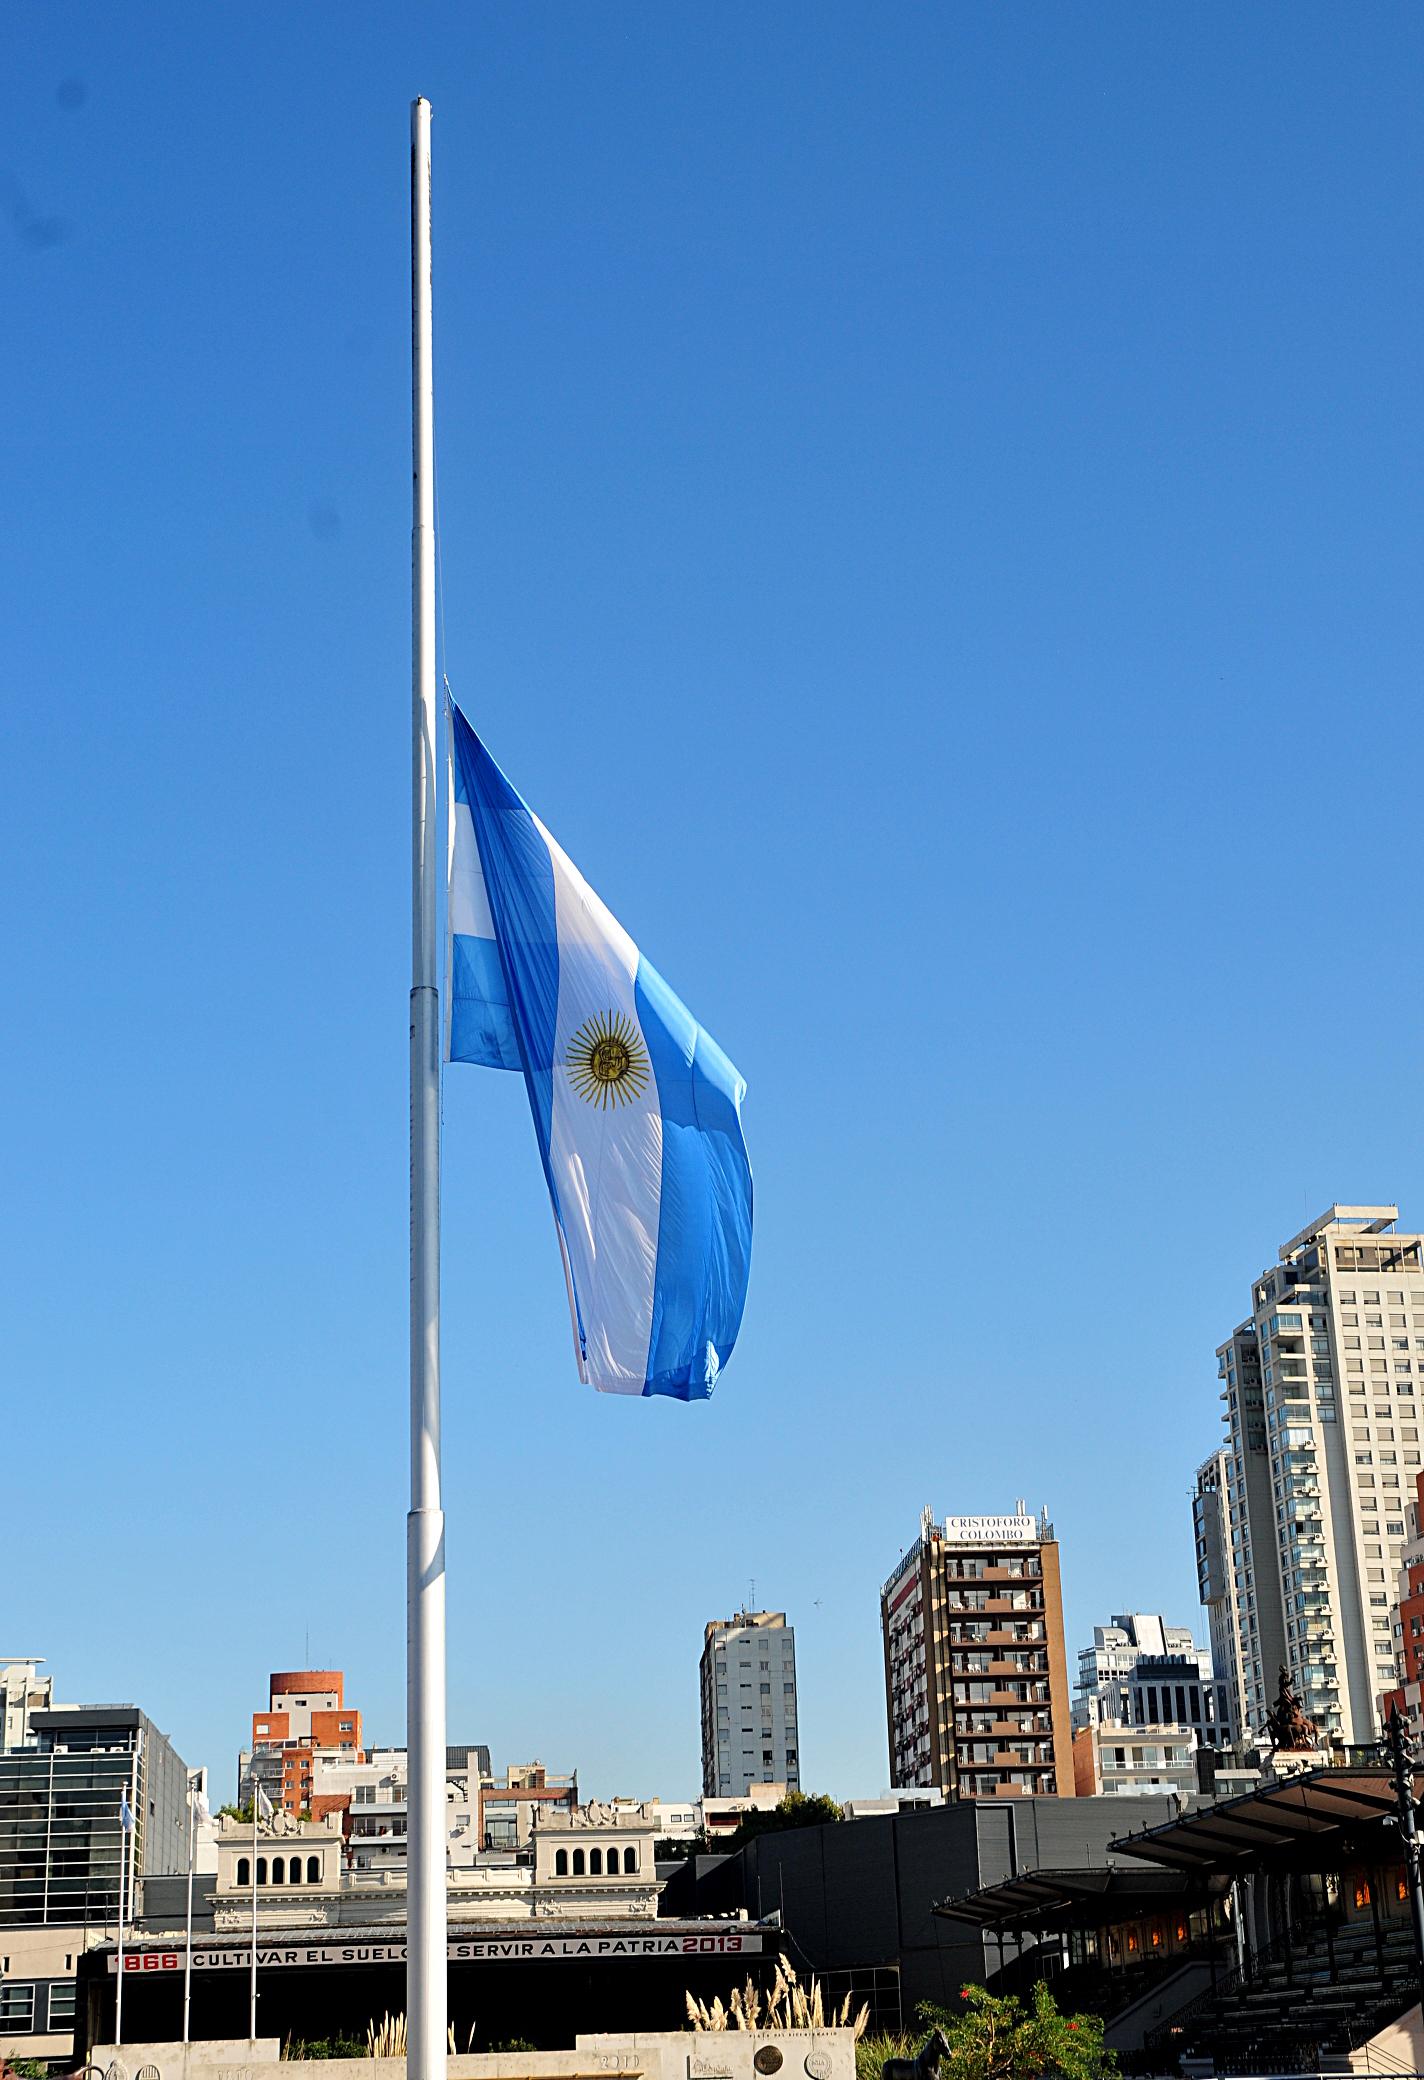 2013-04-04-HalfmastArgentineFlag.jpg